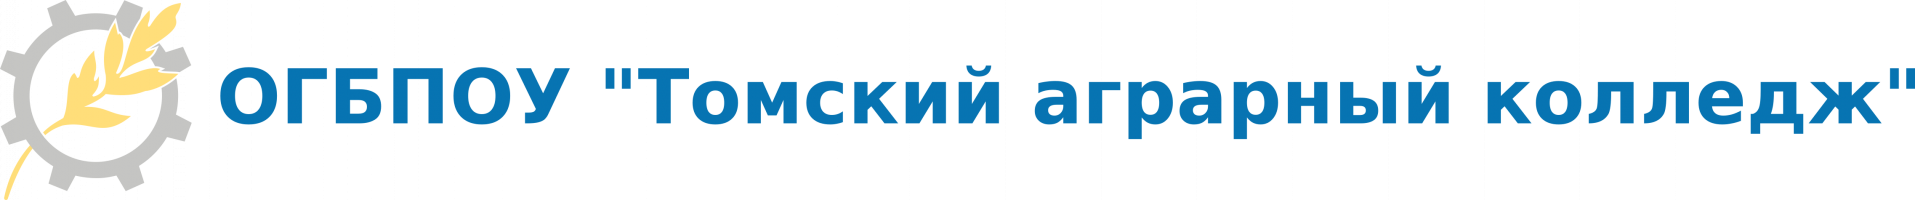 Томский аграрный колледж